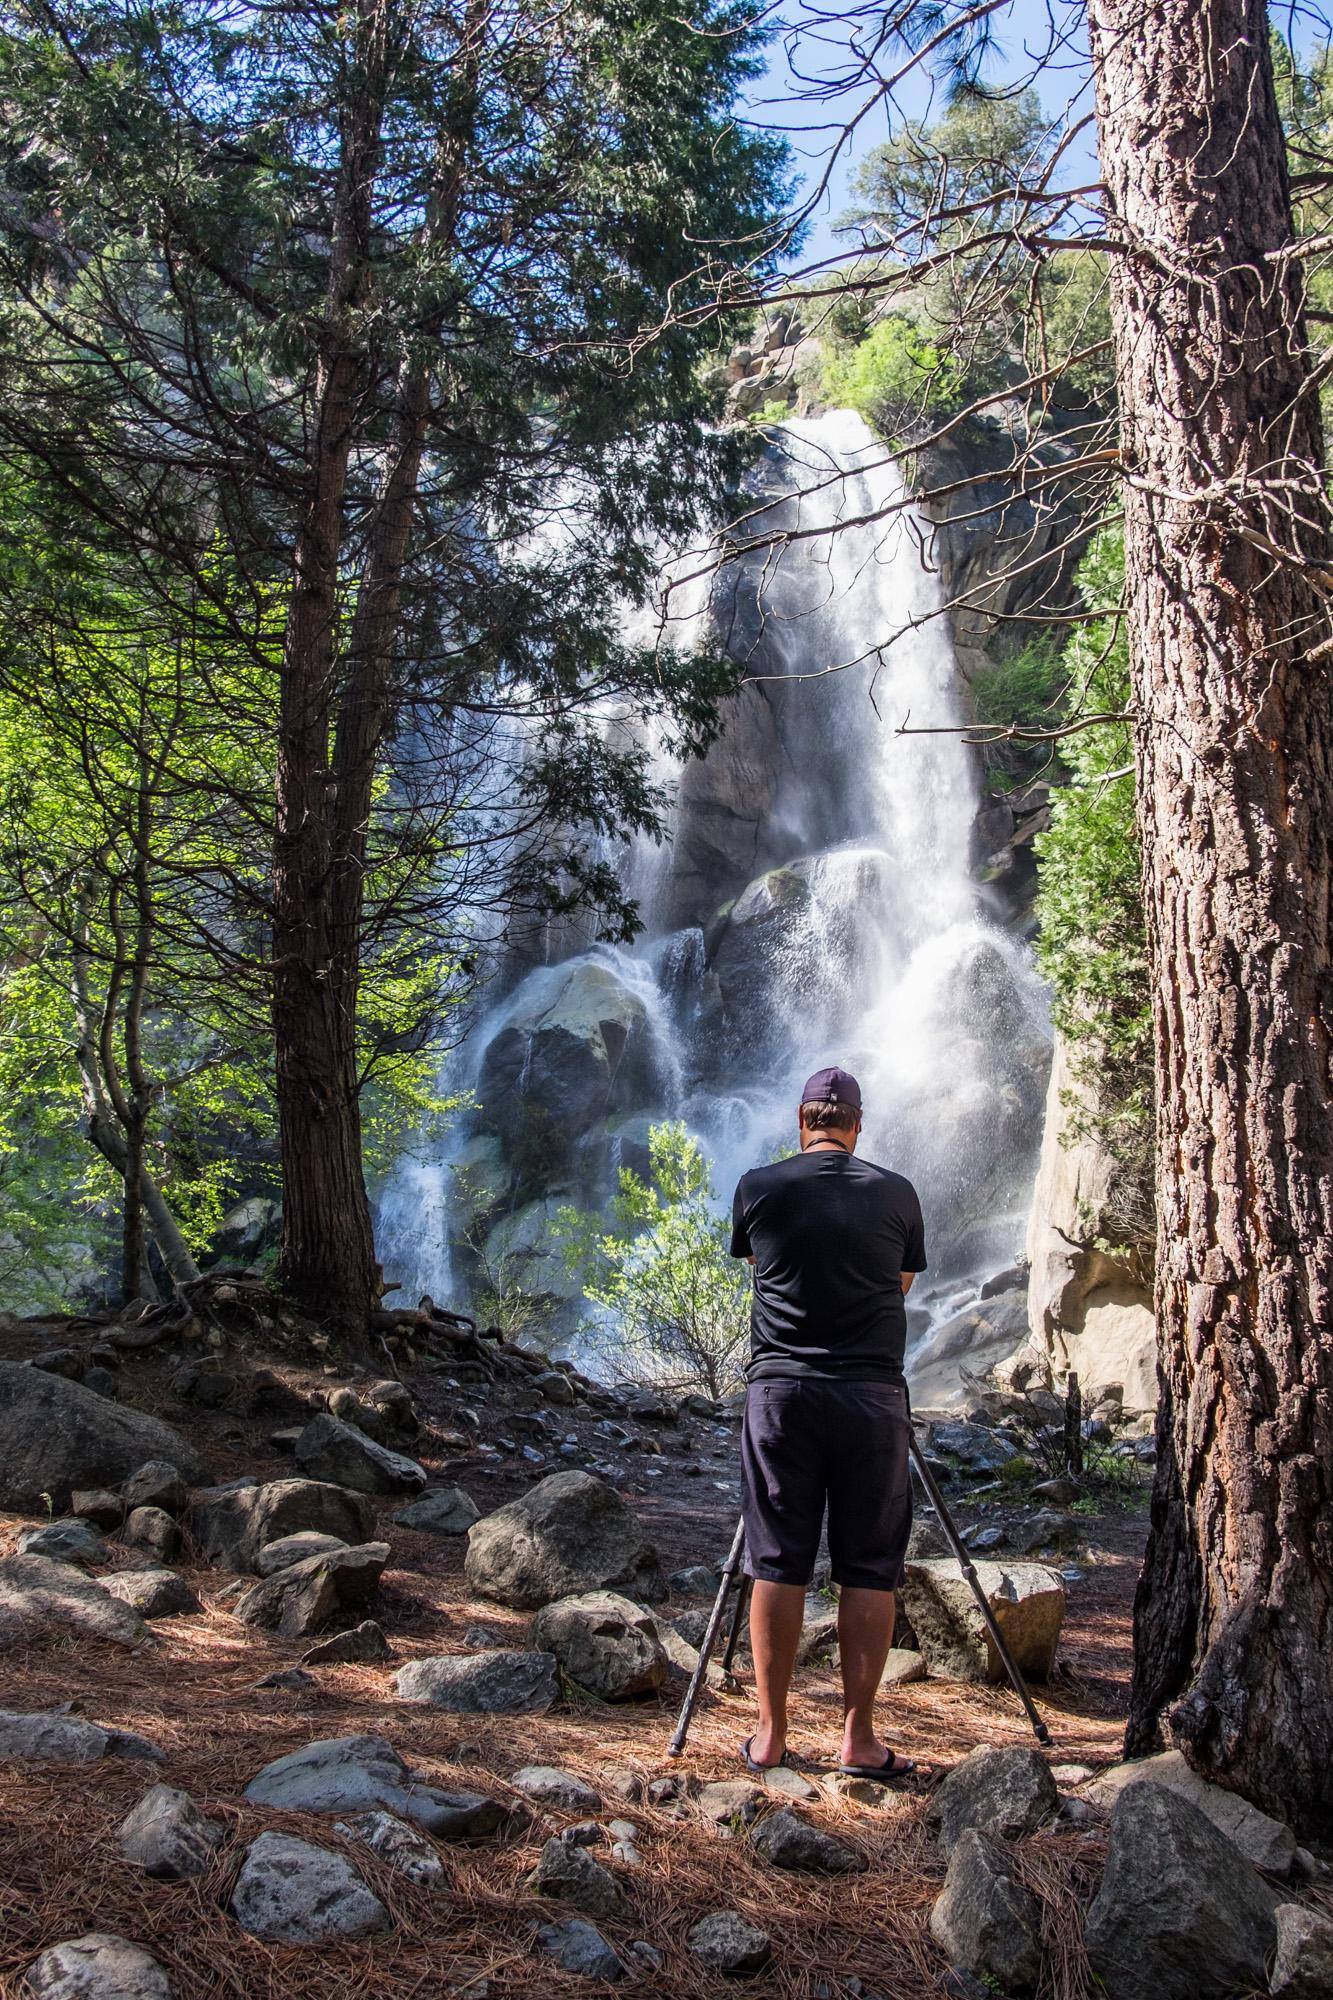 JI shooting the waterfalls along route 180 into the canyon.